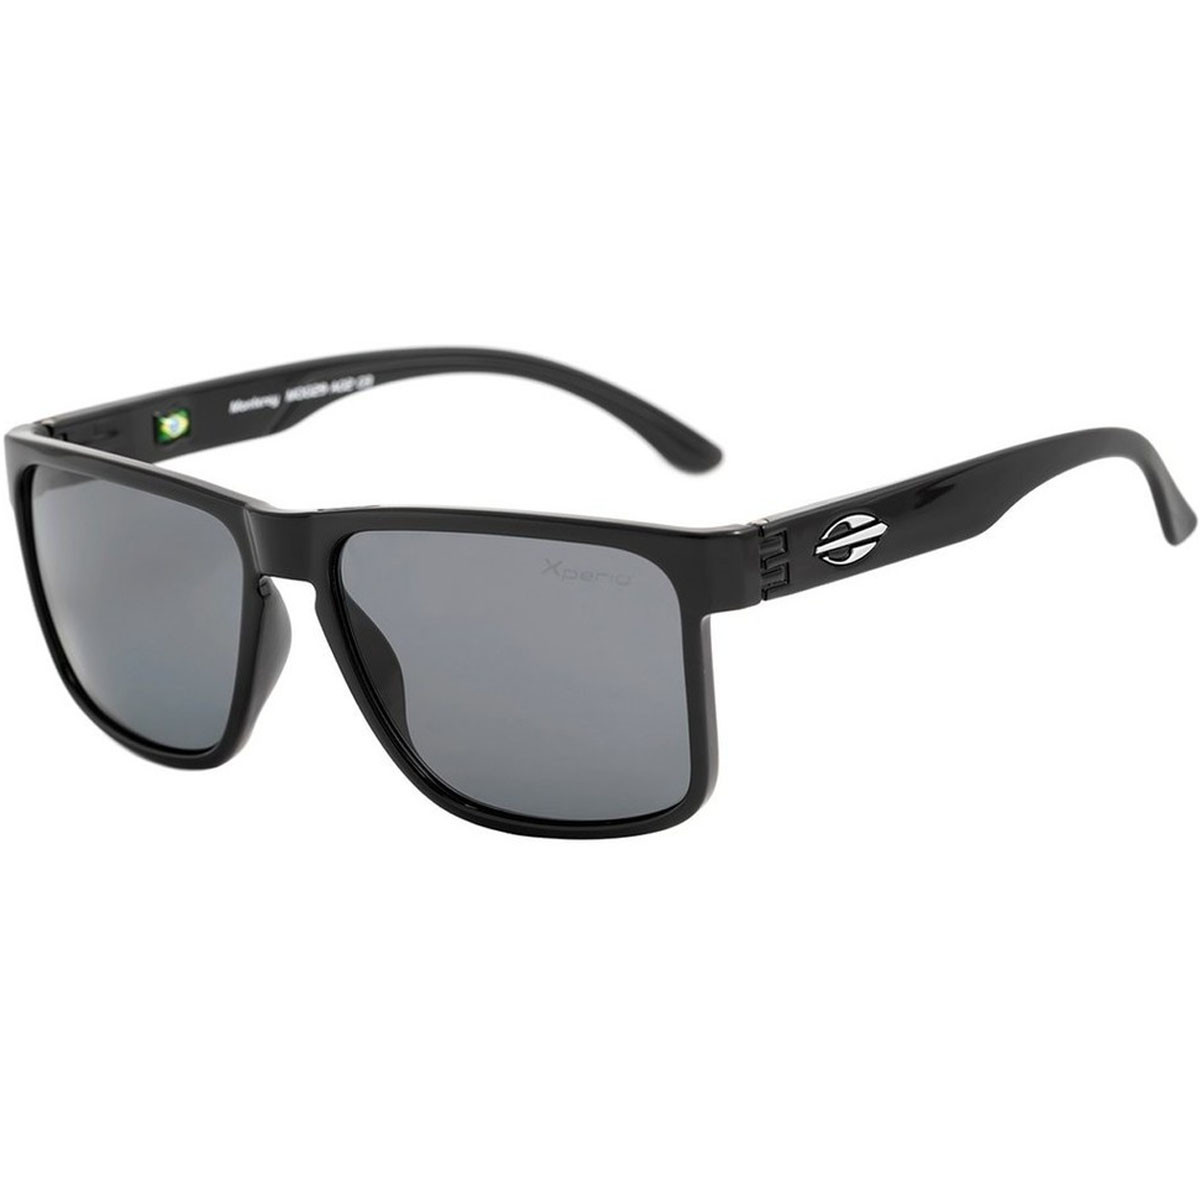 Óculos Mormaii Monterey Preto Brilho  Cinza Polarizado ref M0029A0203 6a5a54a06f